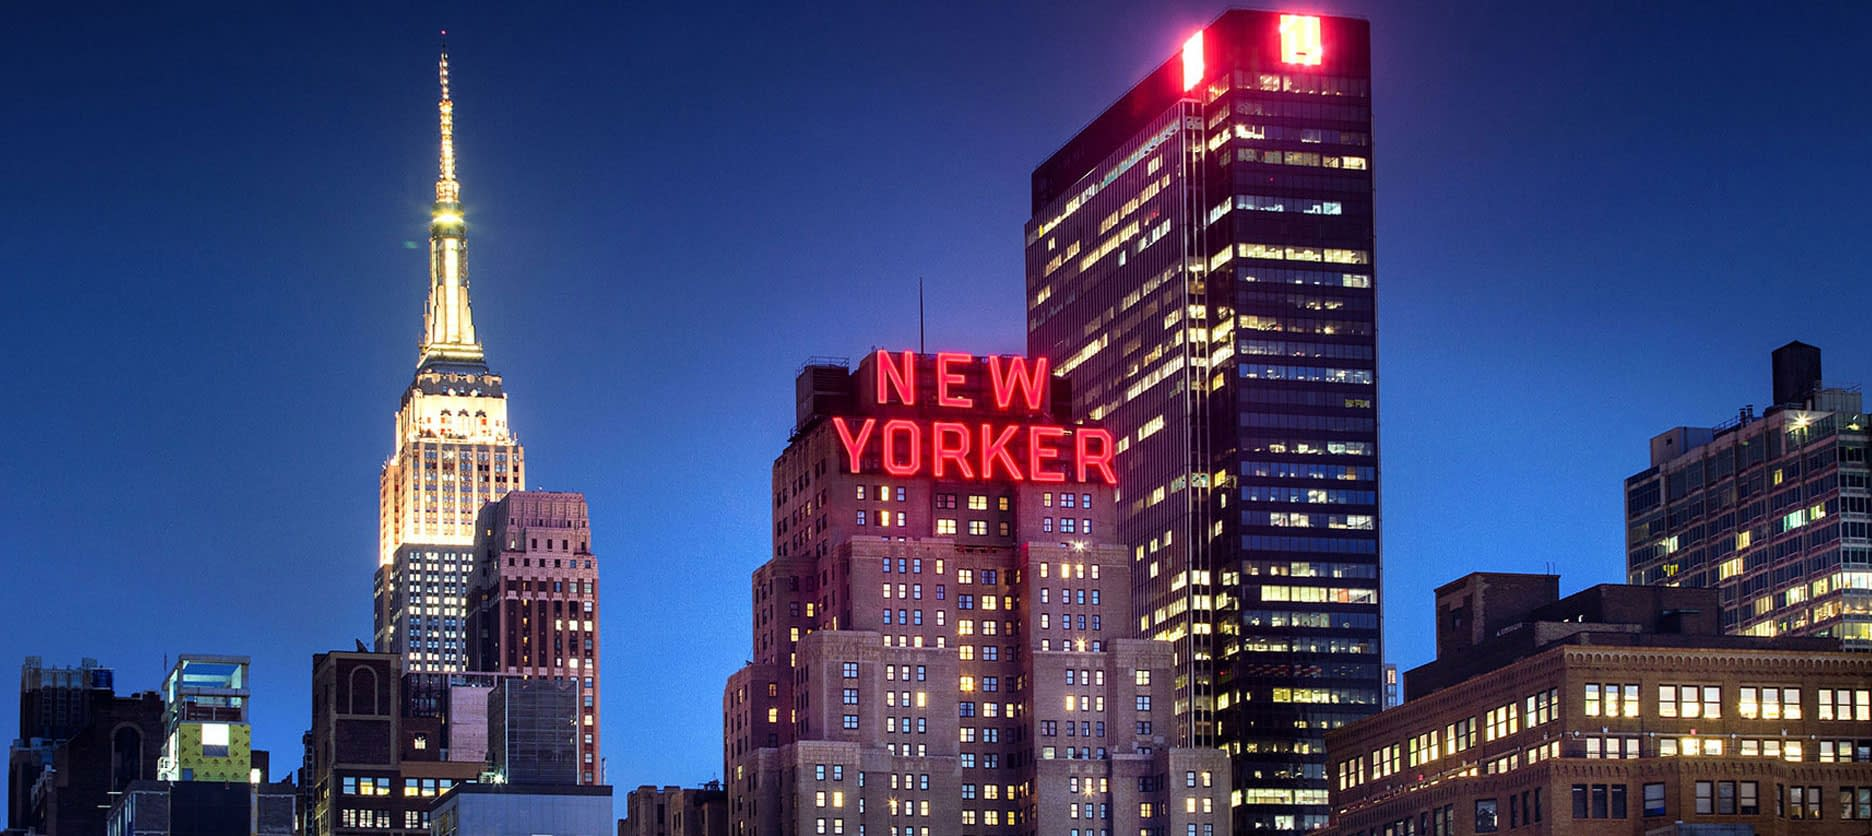 New Yorker Wyndham Hotel skyline